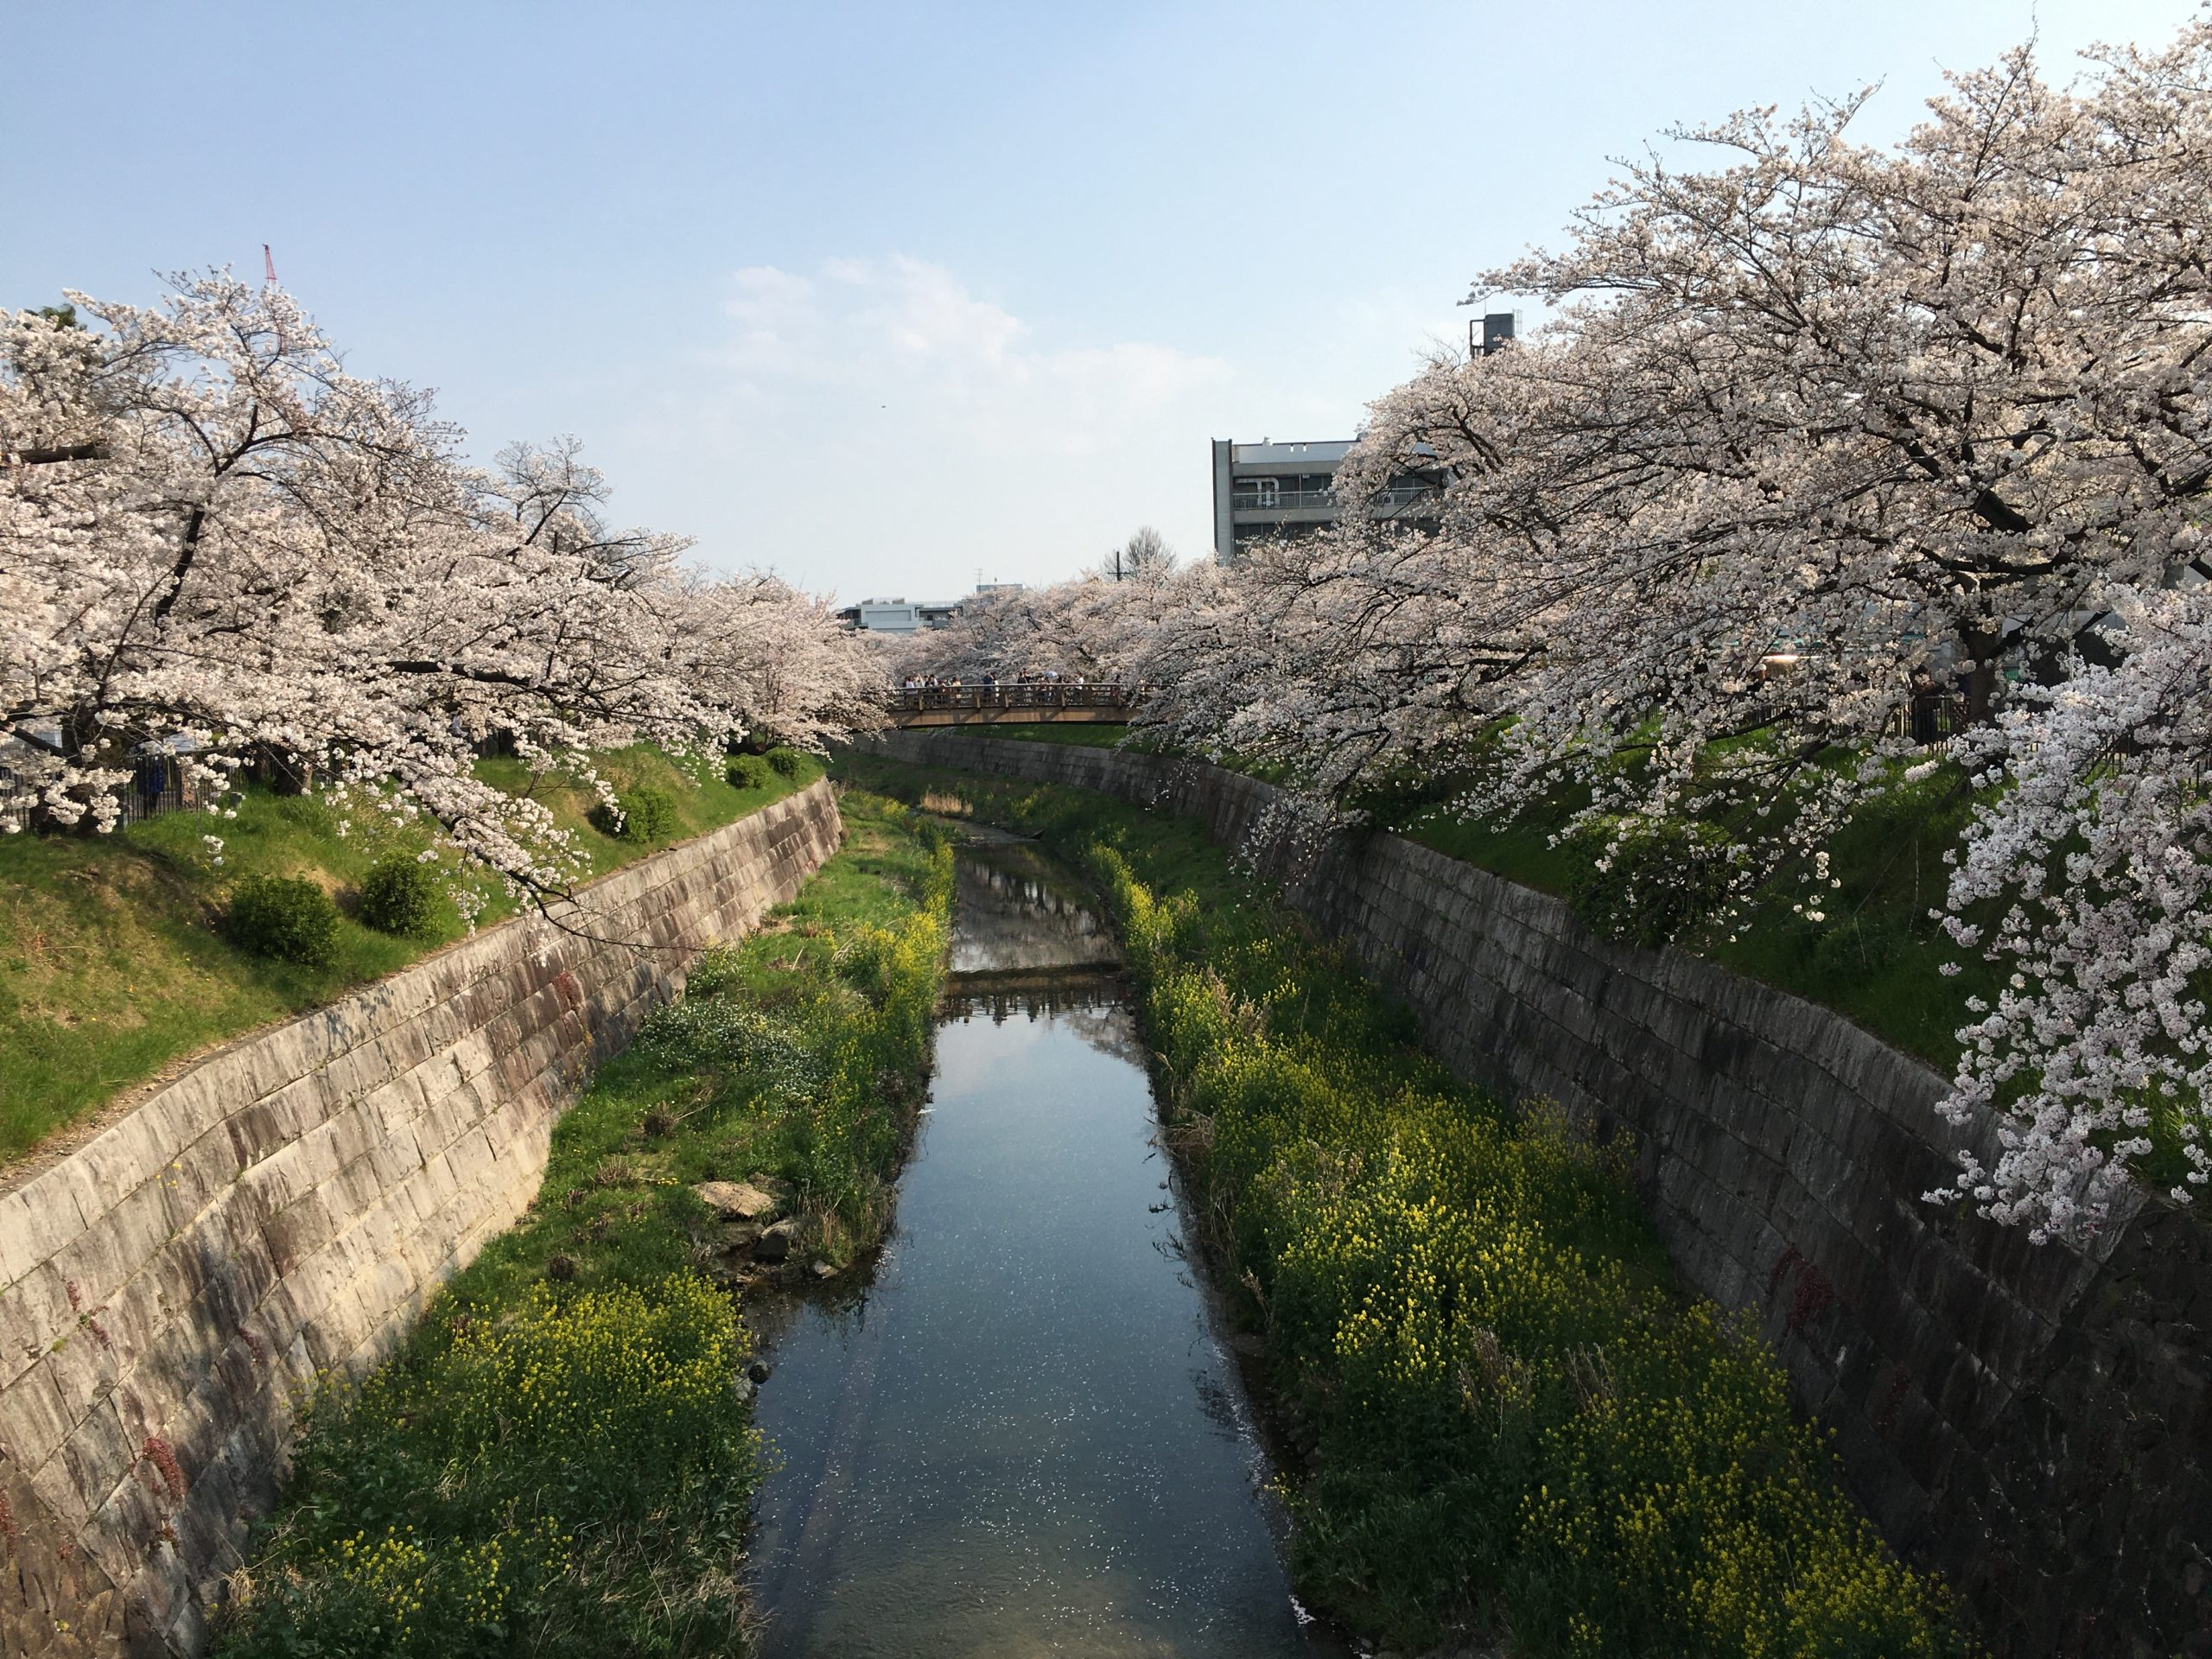 yamazaki-river-sakura